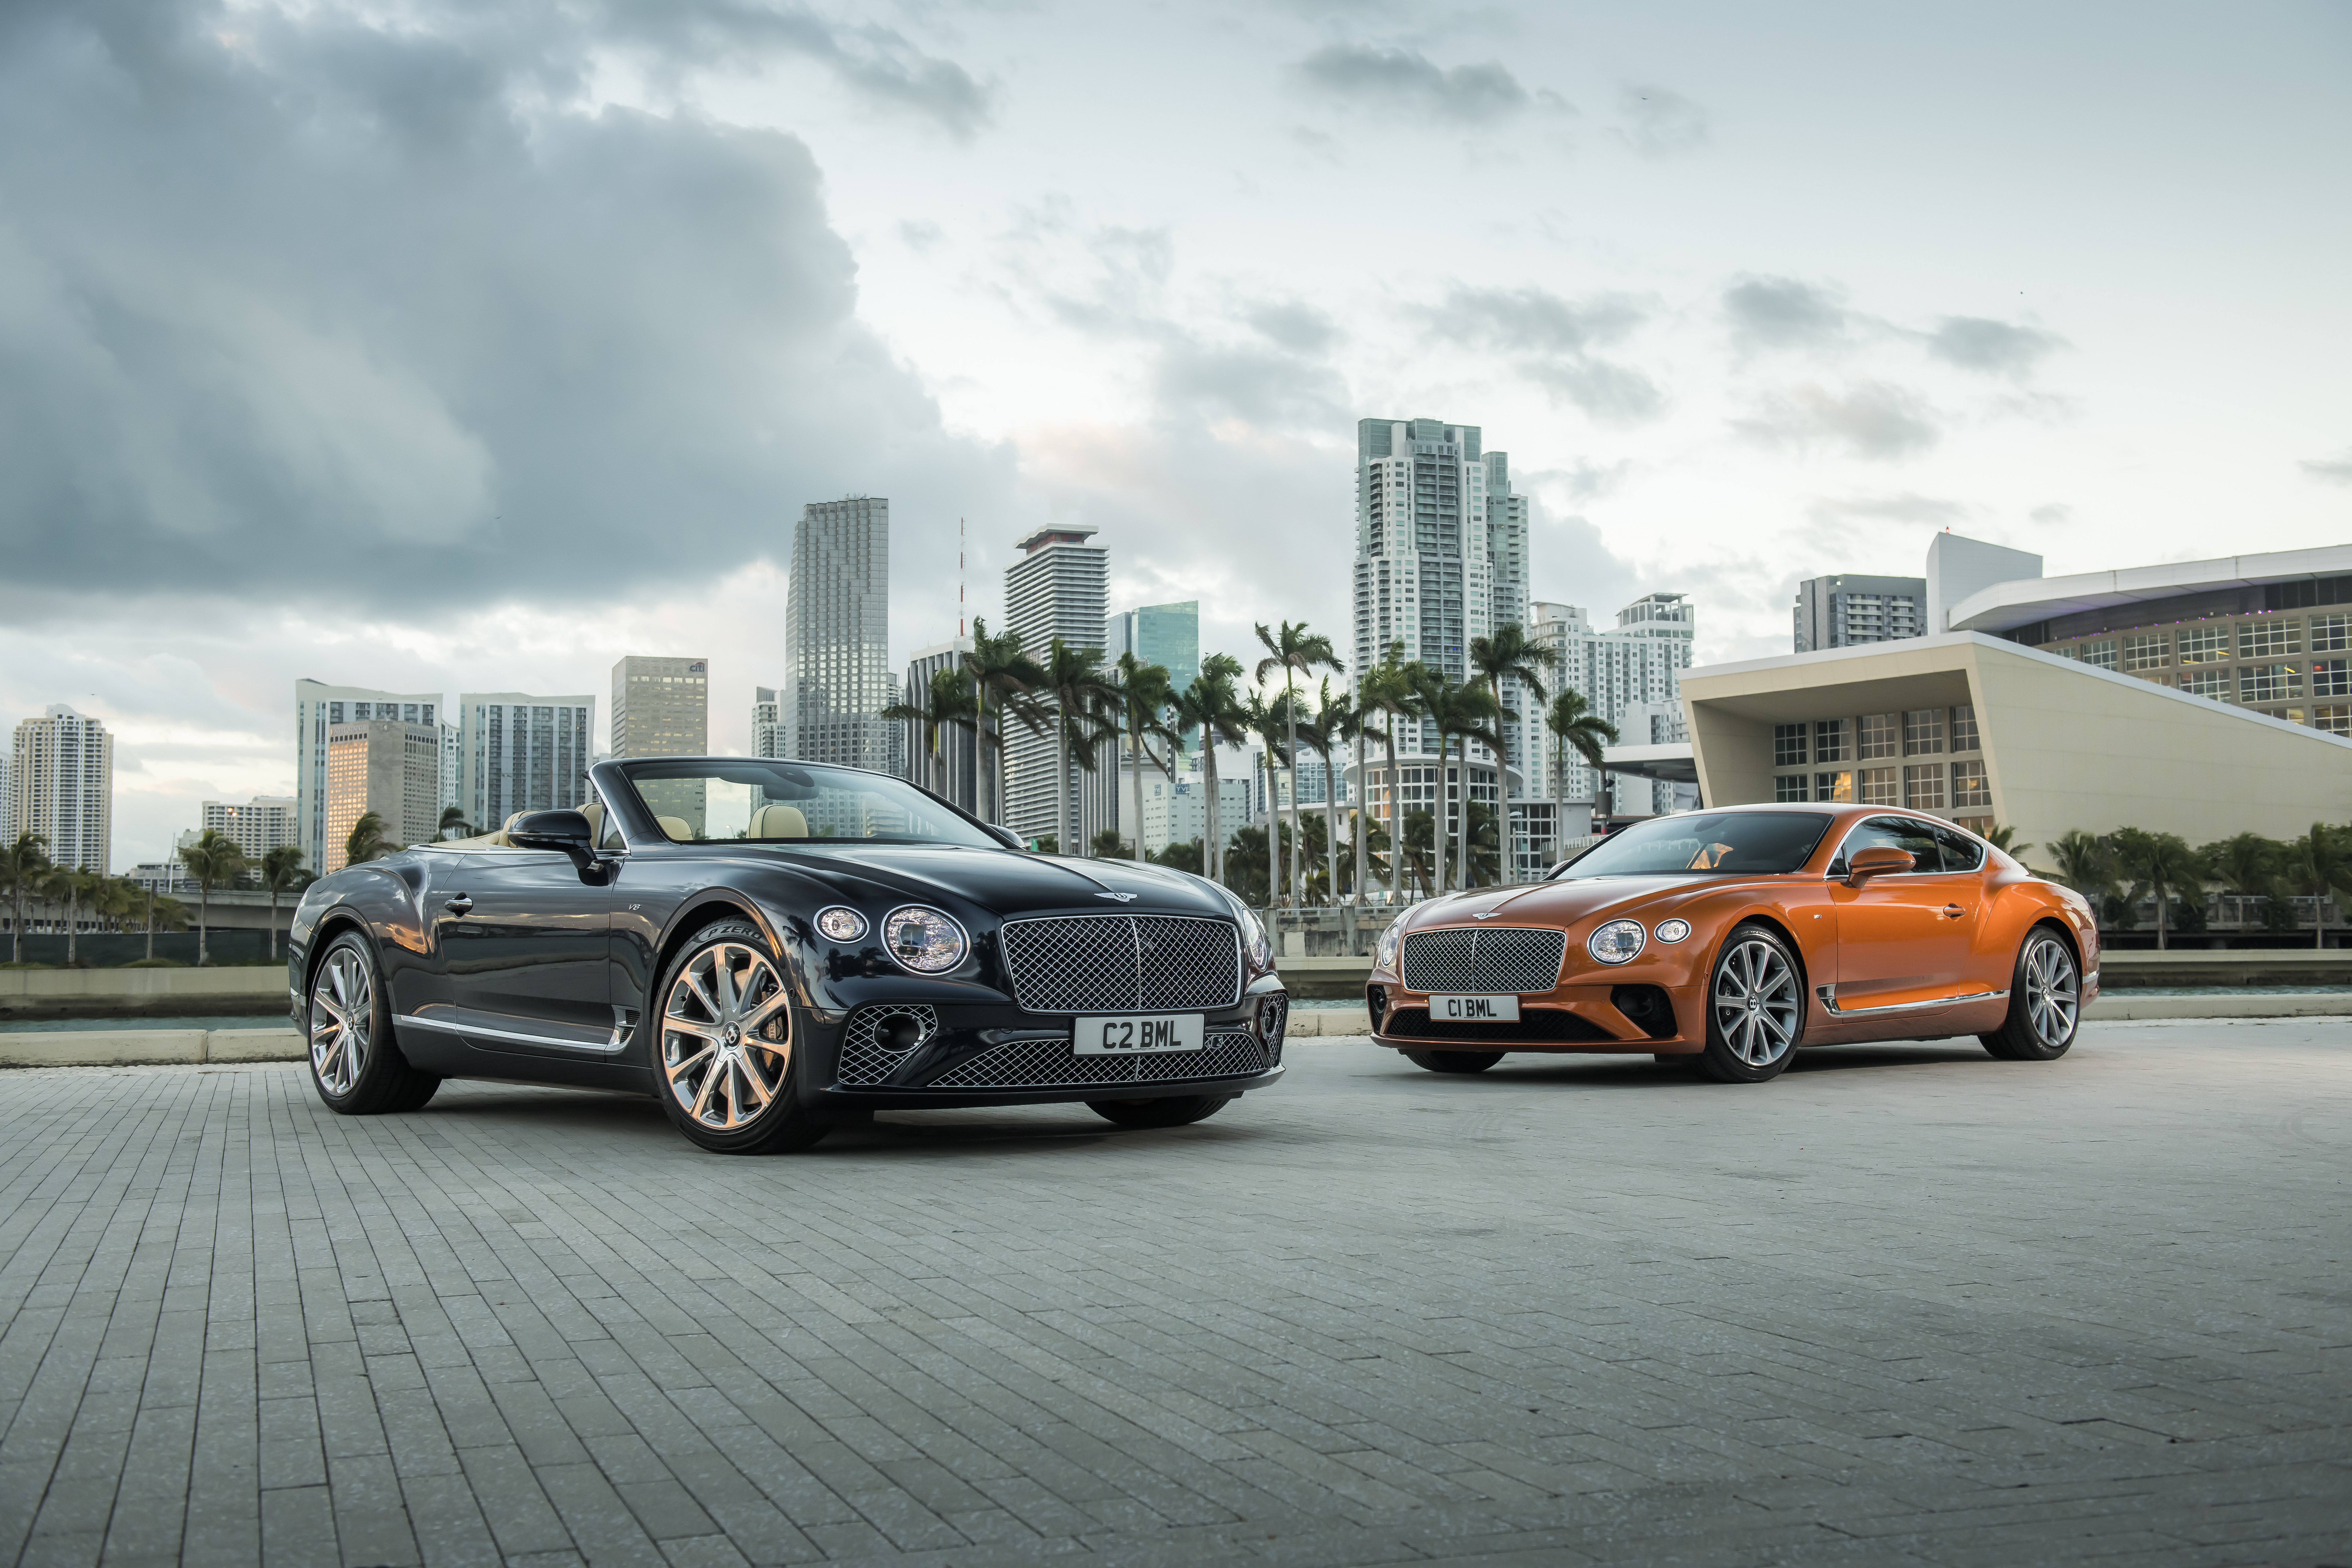 Bentley Continental GT V8 Mk3 (2019)